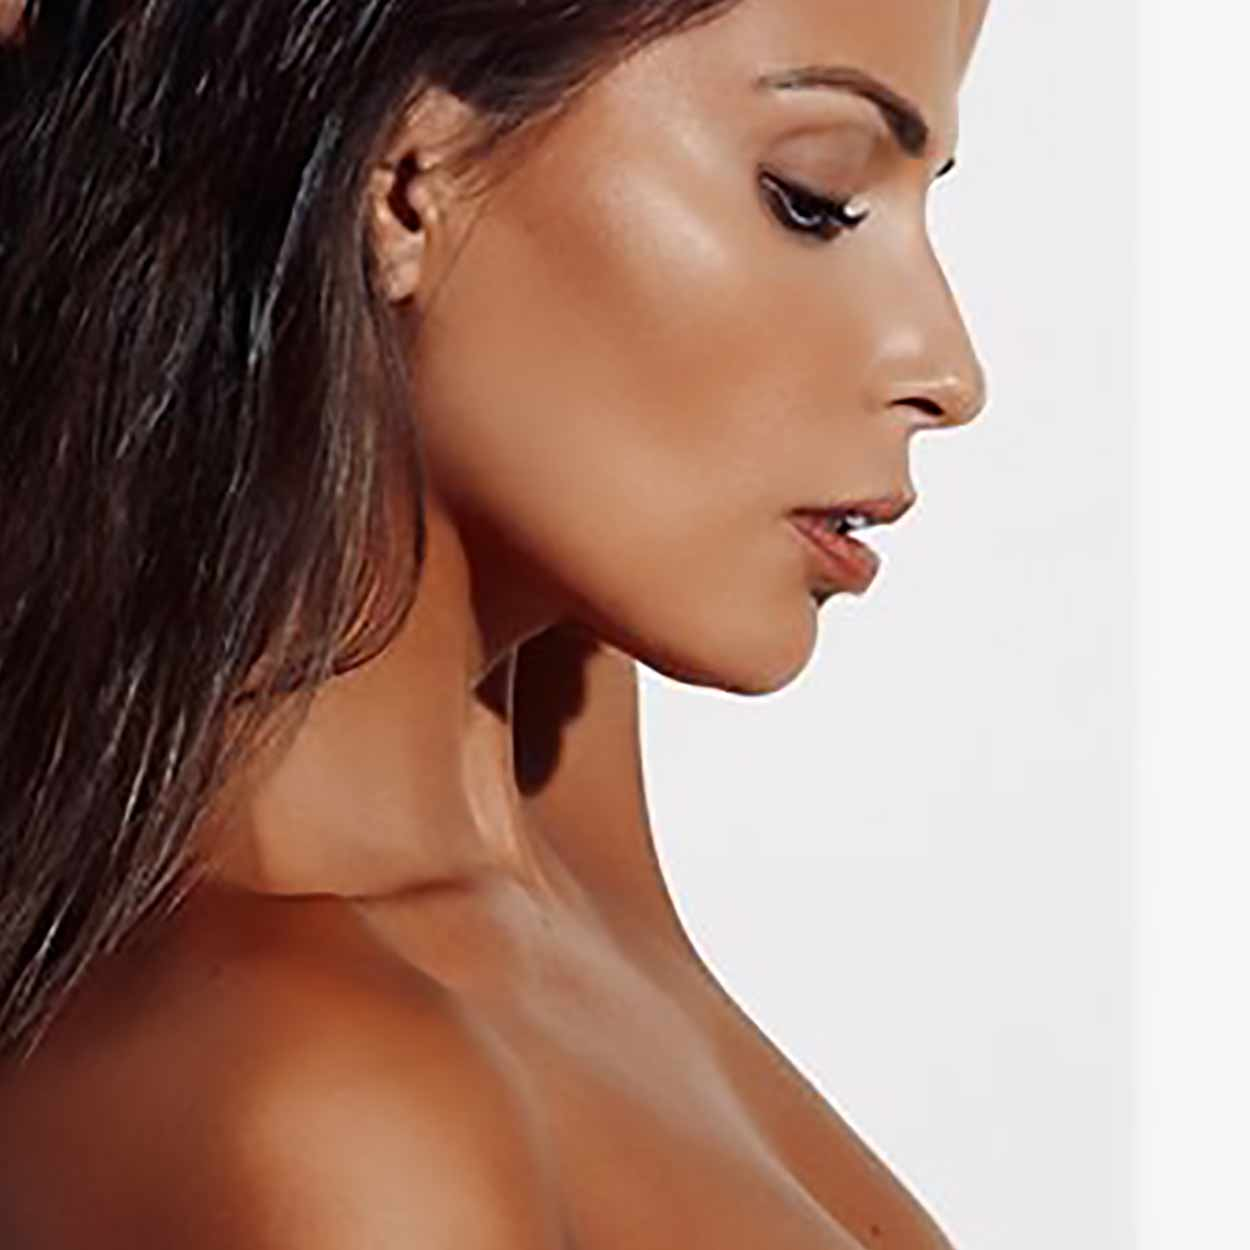 beauty influencer; skincare; bueaty; blogger; jo freeman; @the__glow__girl; luxury; anti ageing; anti aging; moisturiser; serum; eye serum; beauty brand